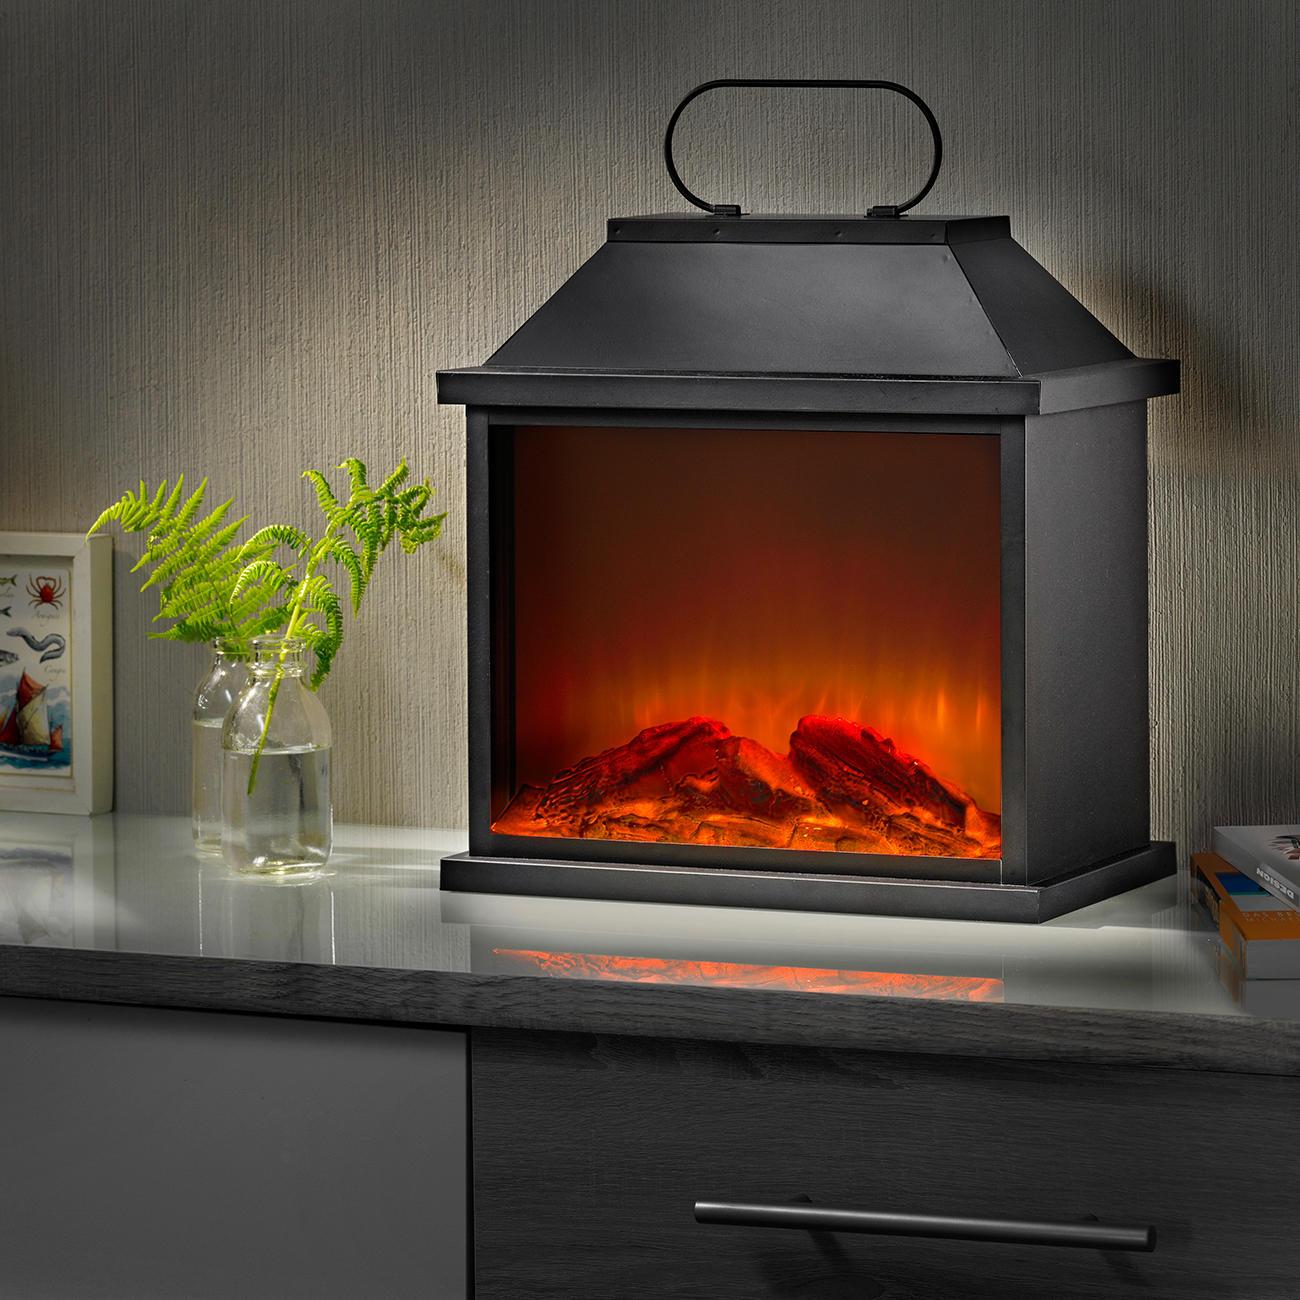 kaminfeuer laterne 3 jahre garantie pro idee. Black Bedroom Furniture Sets. Home Design Ideas